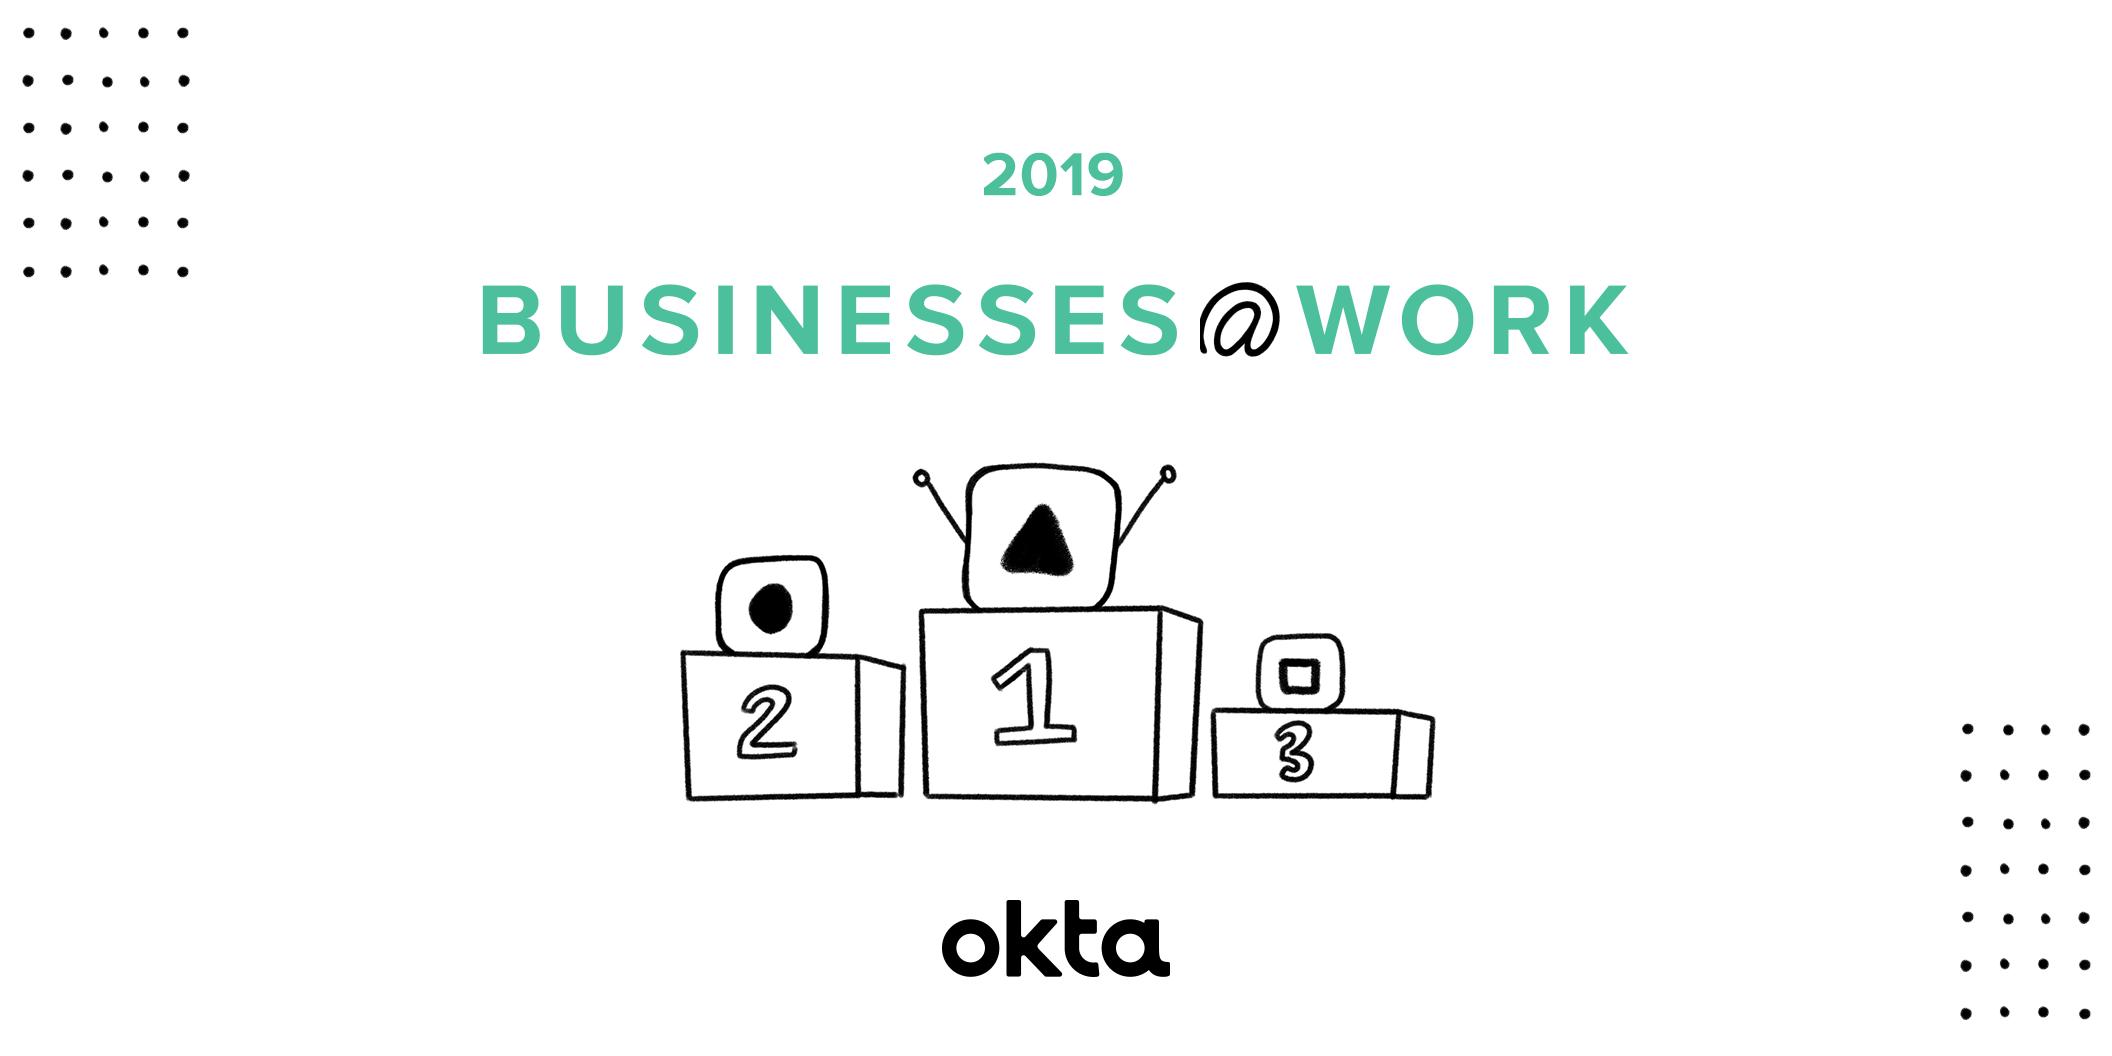 Businesses at Work 2019 | Okta